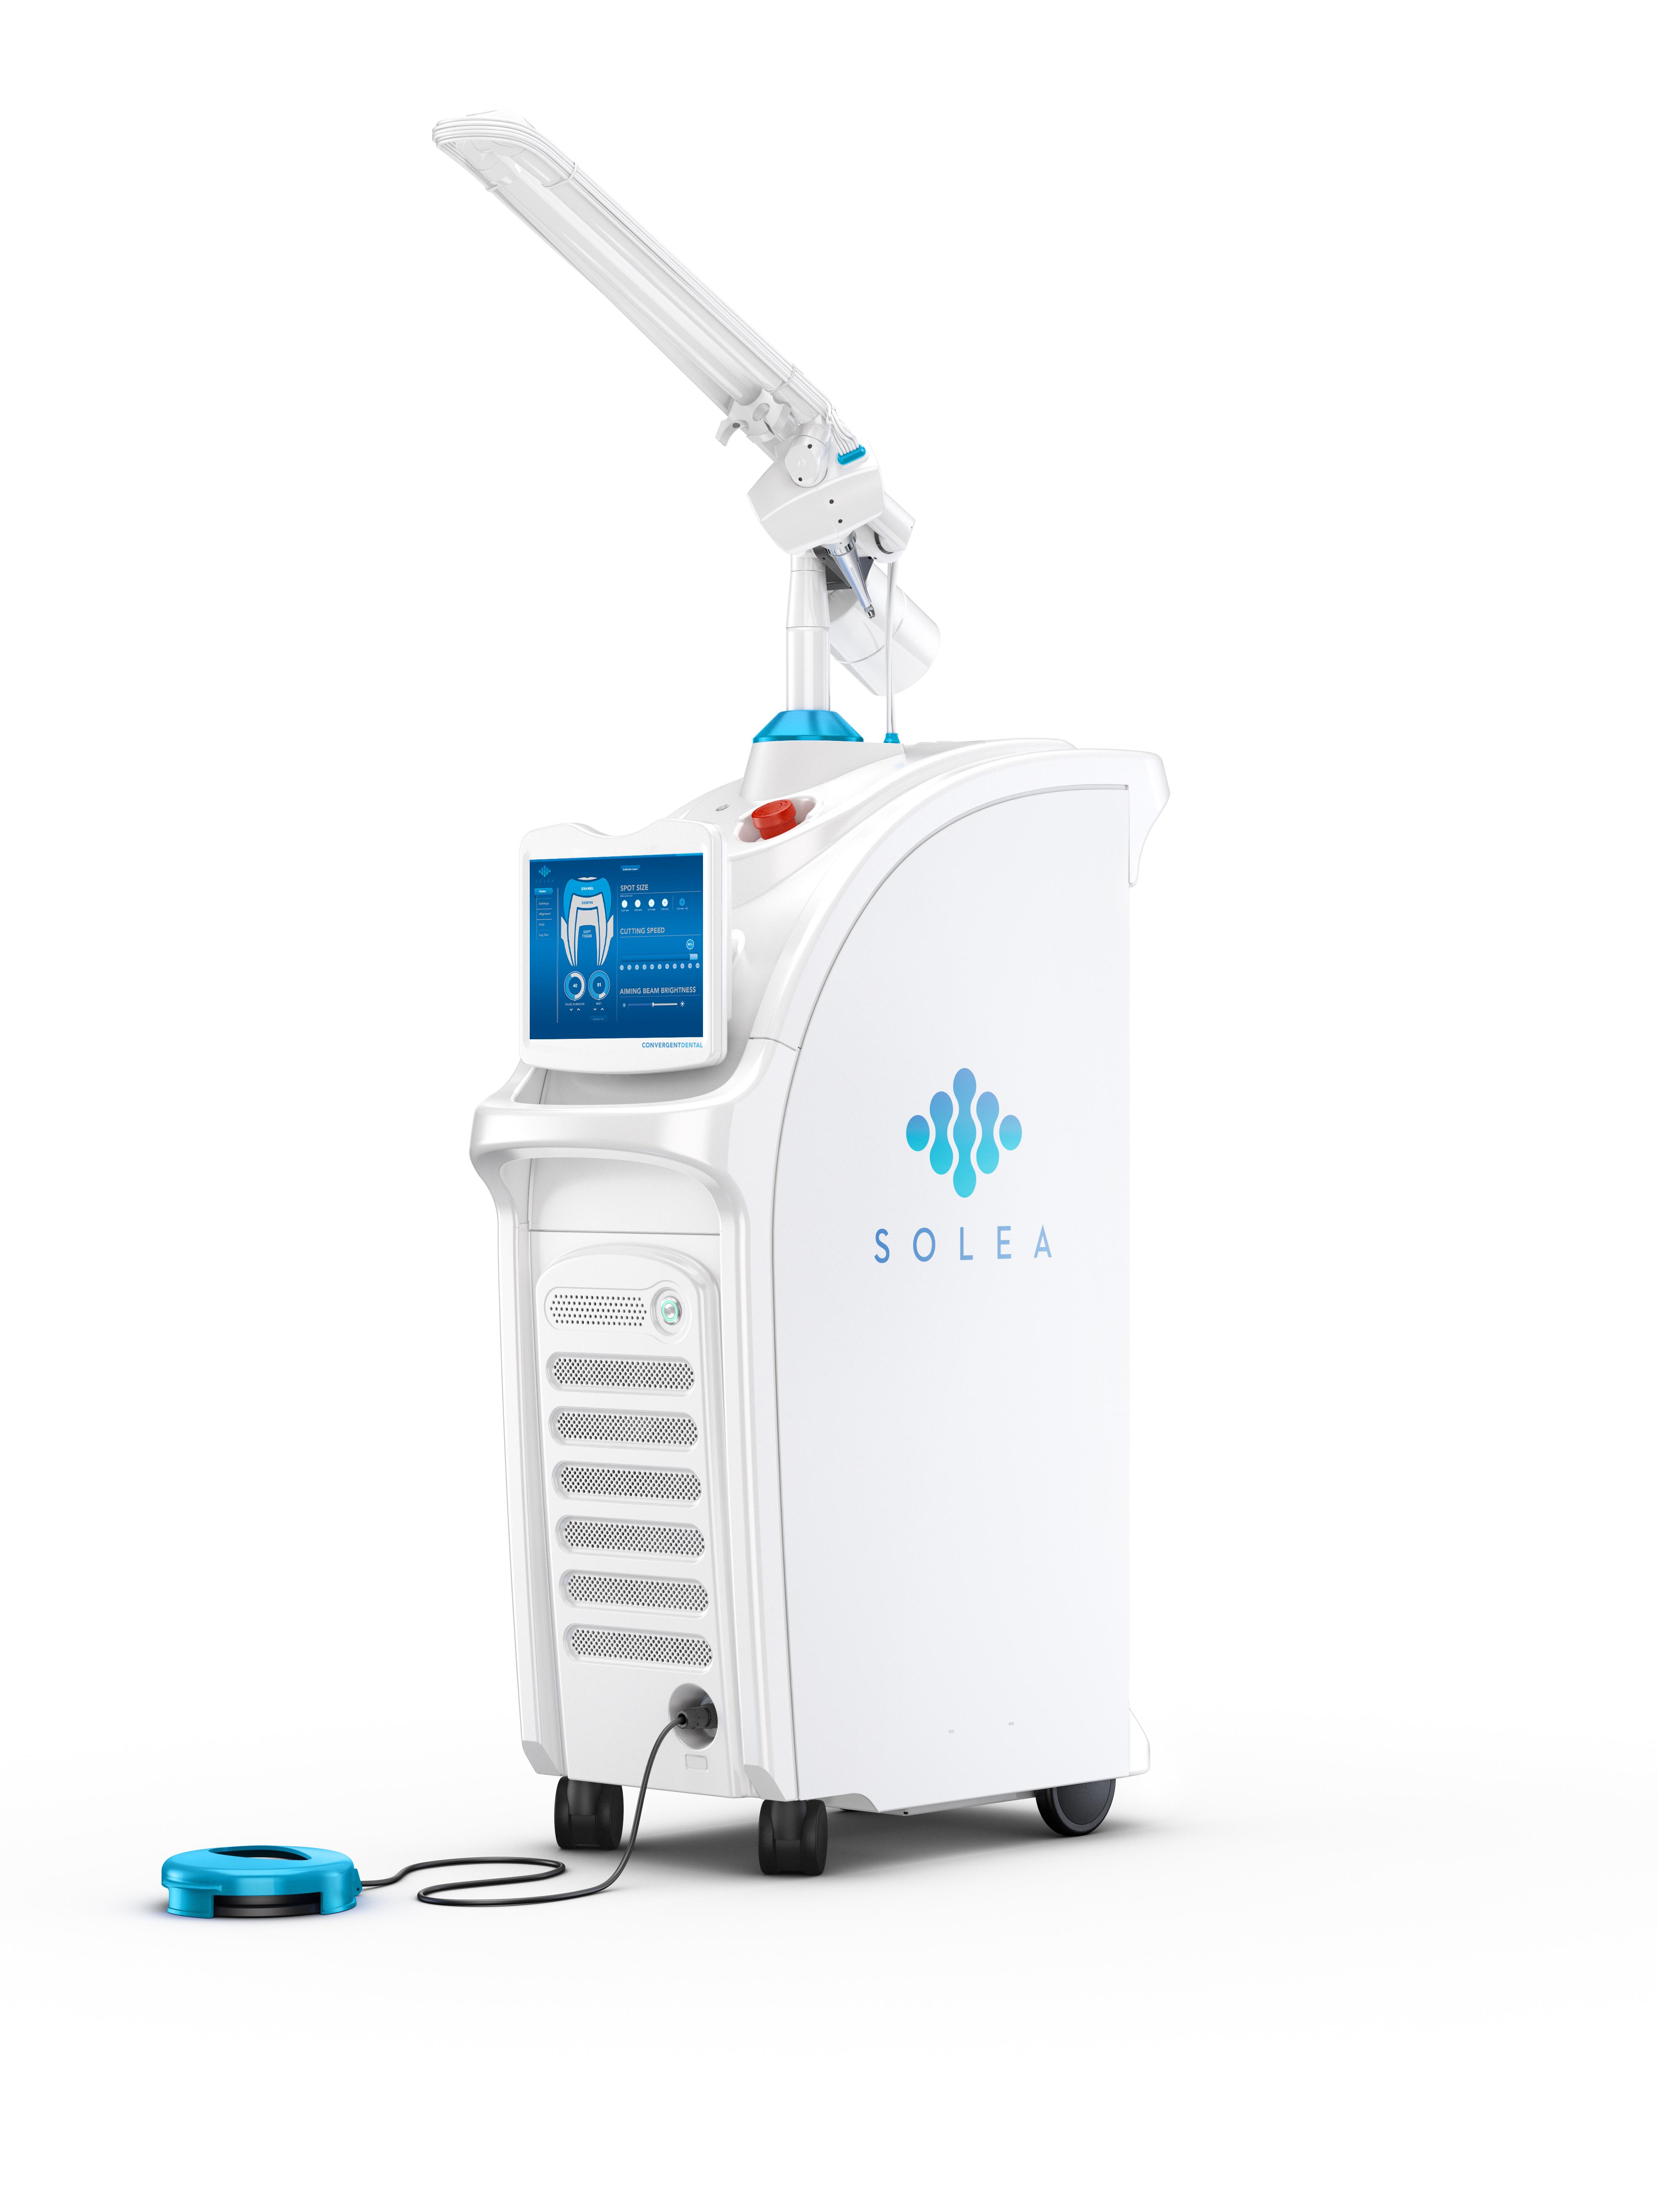 https://www.pattersondental.com/Equipment-Technology/Product/237545/solea-laser